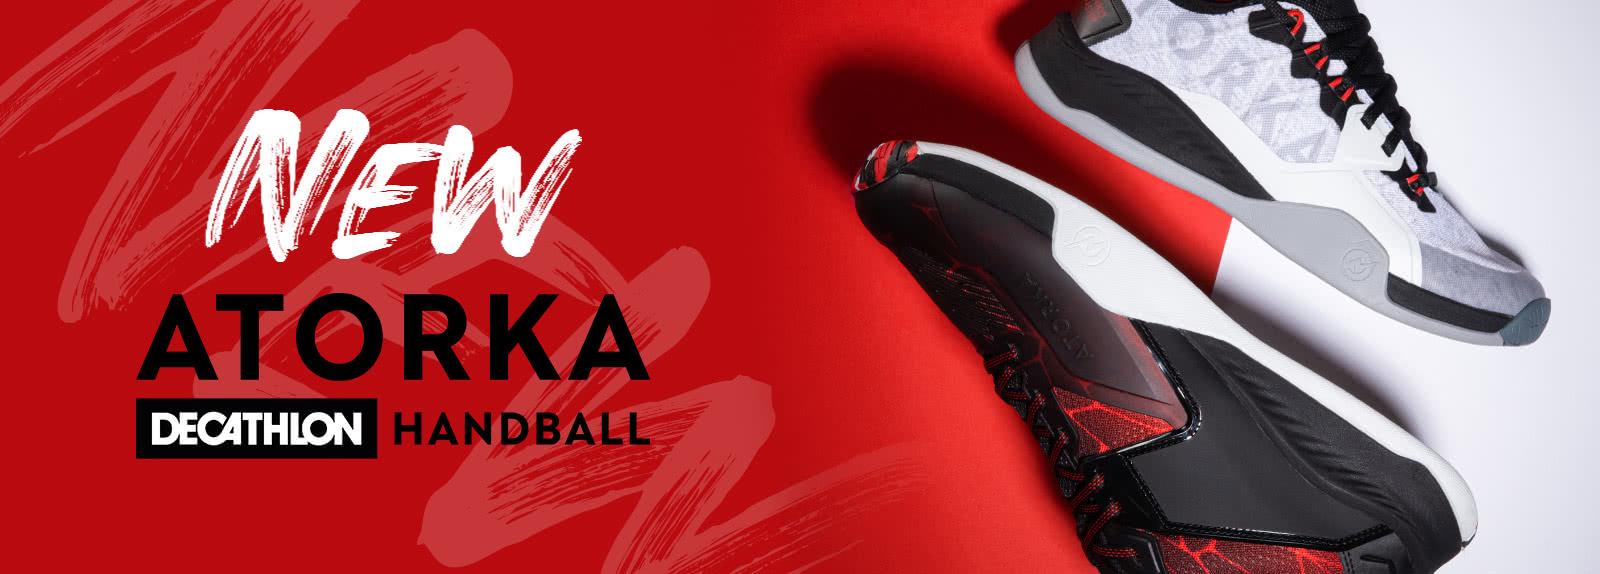 Atorka nouvelles chaussures